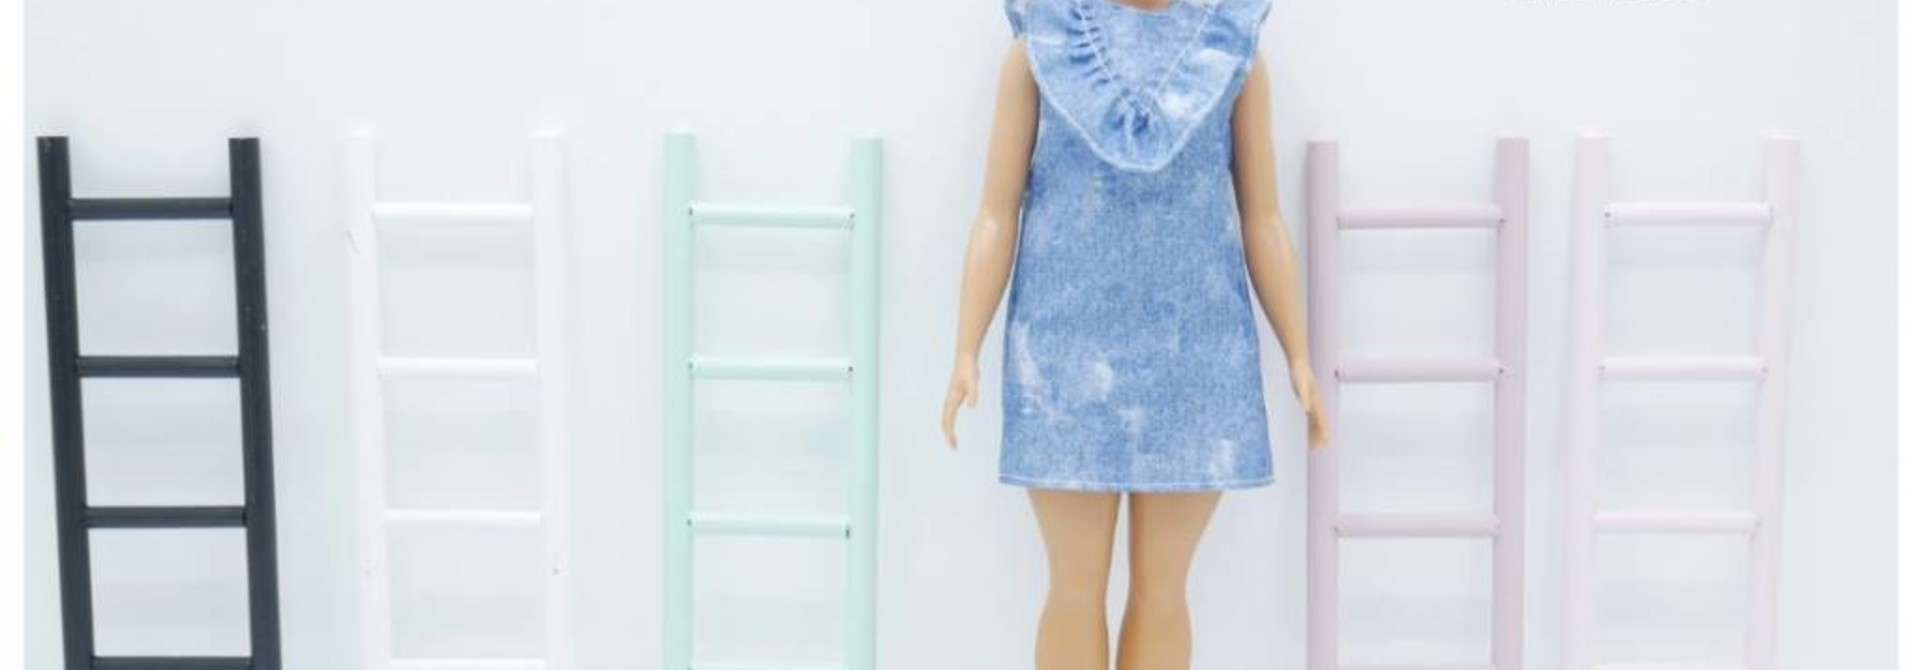 Decoration Ladder Barbie